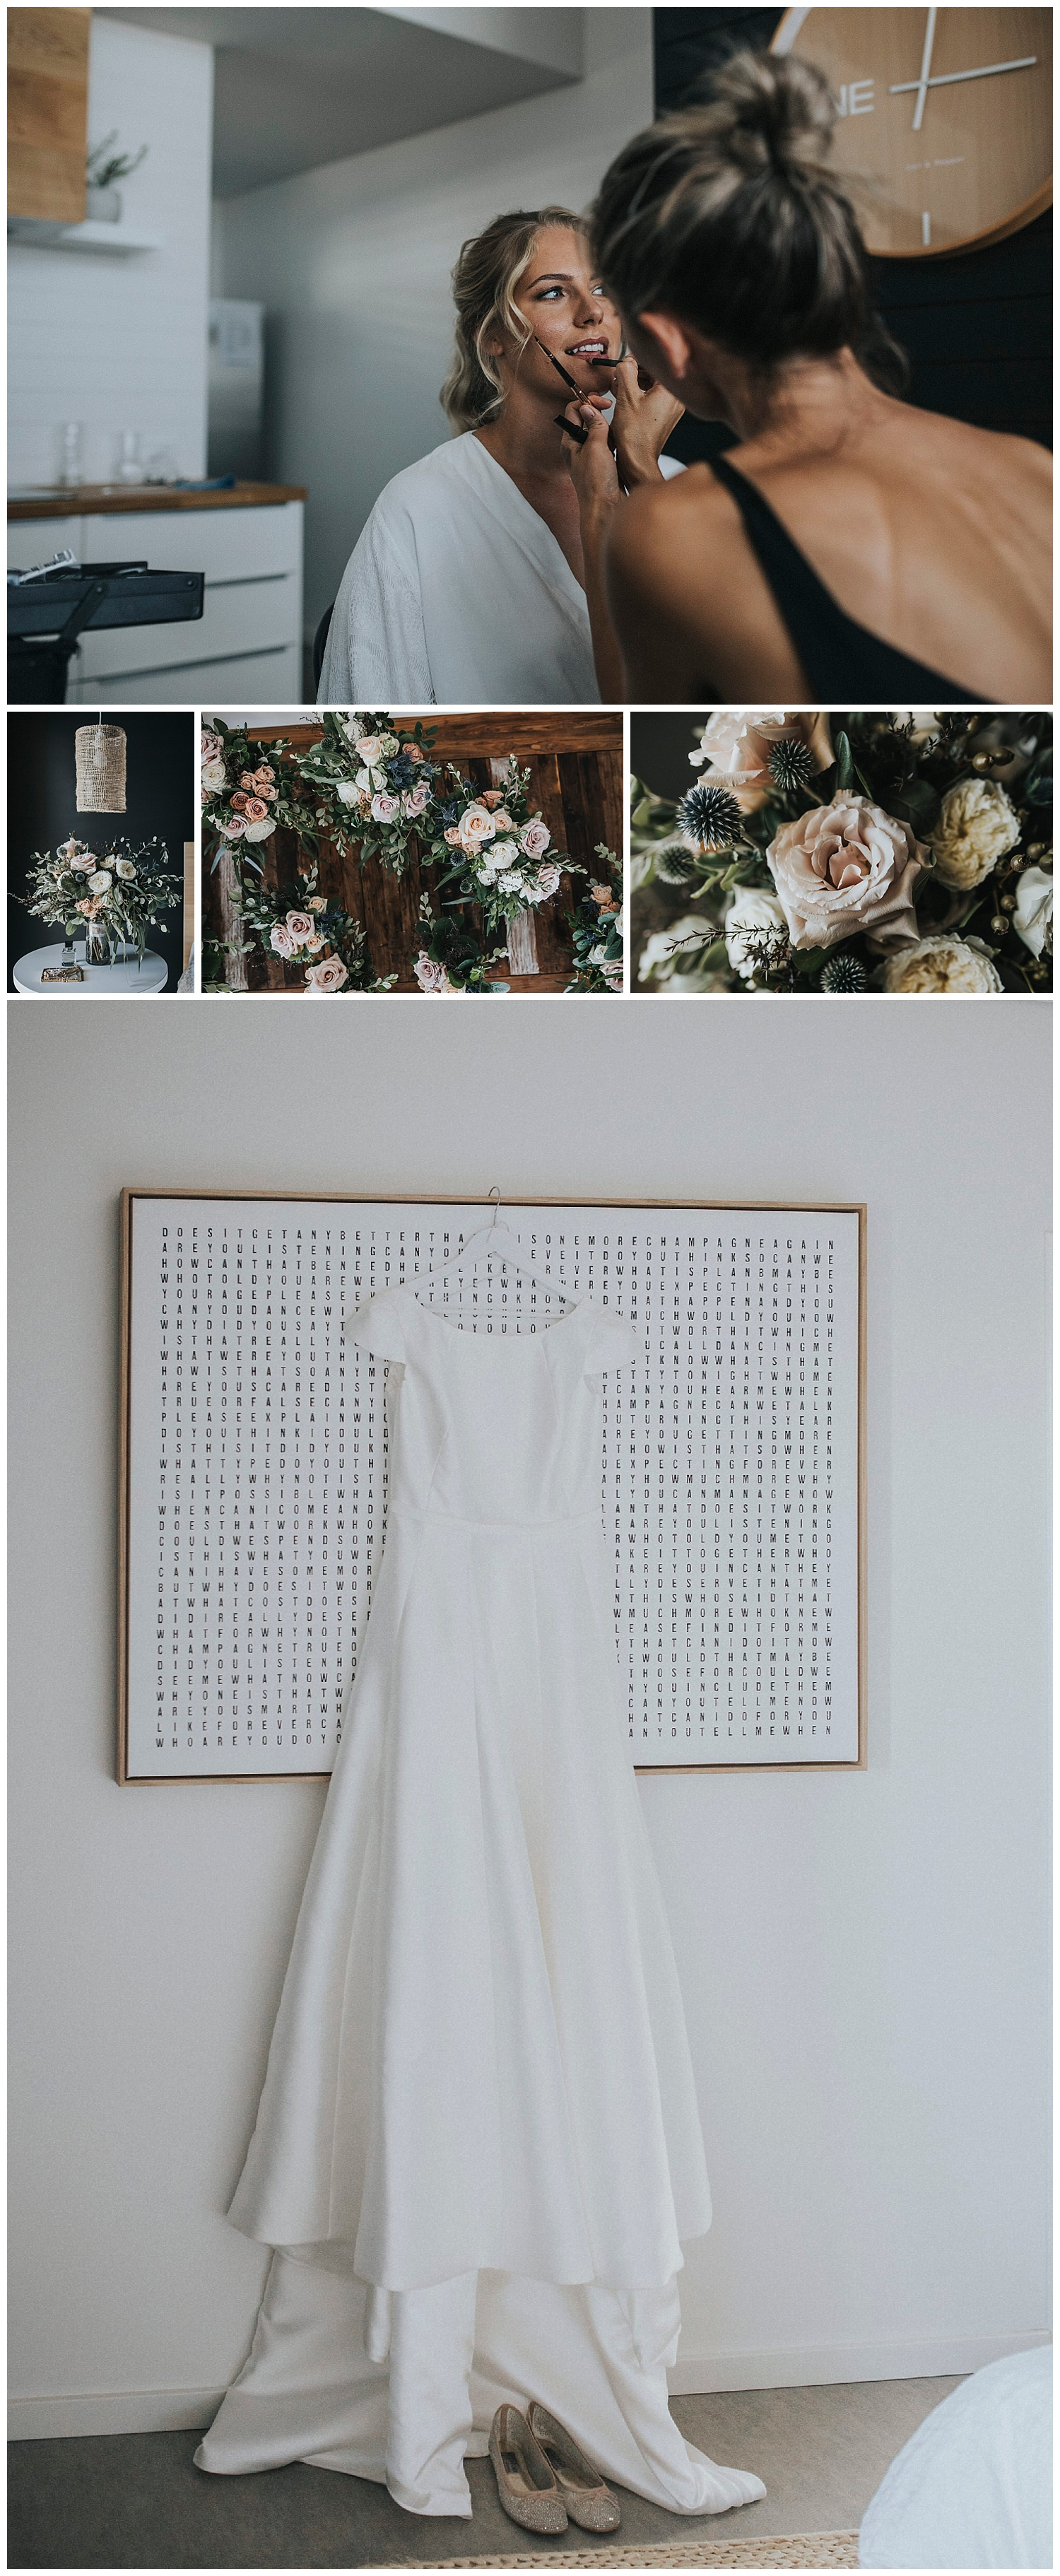 olio_bello_wedding_keeper_creative_004.JPG